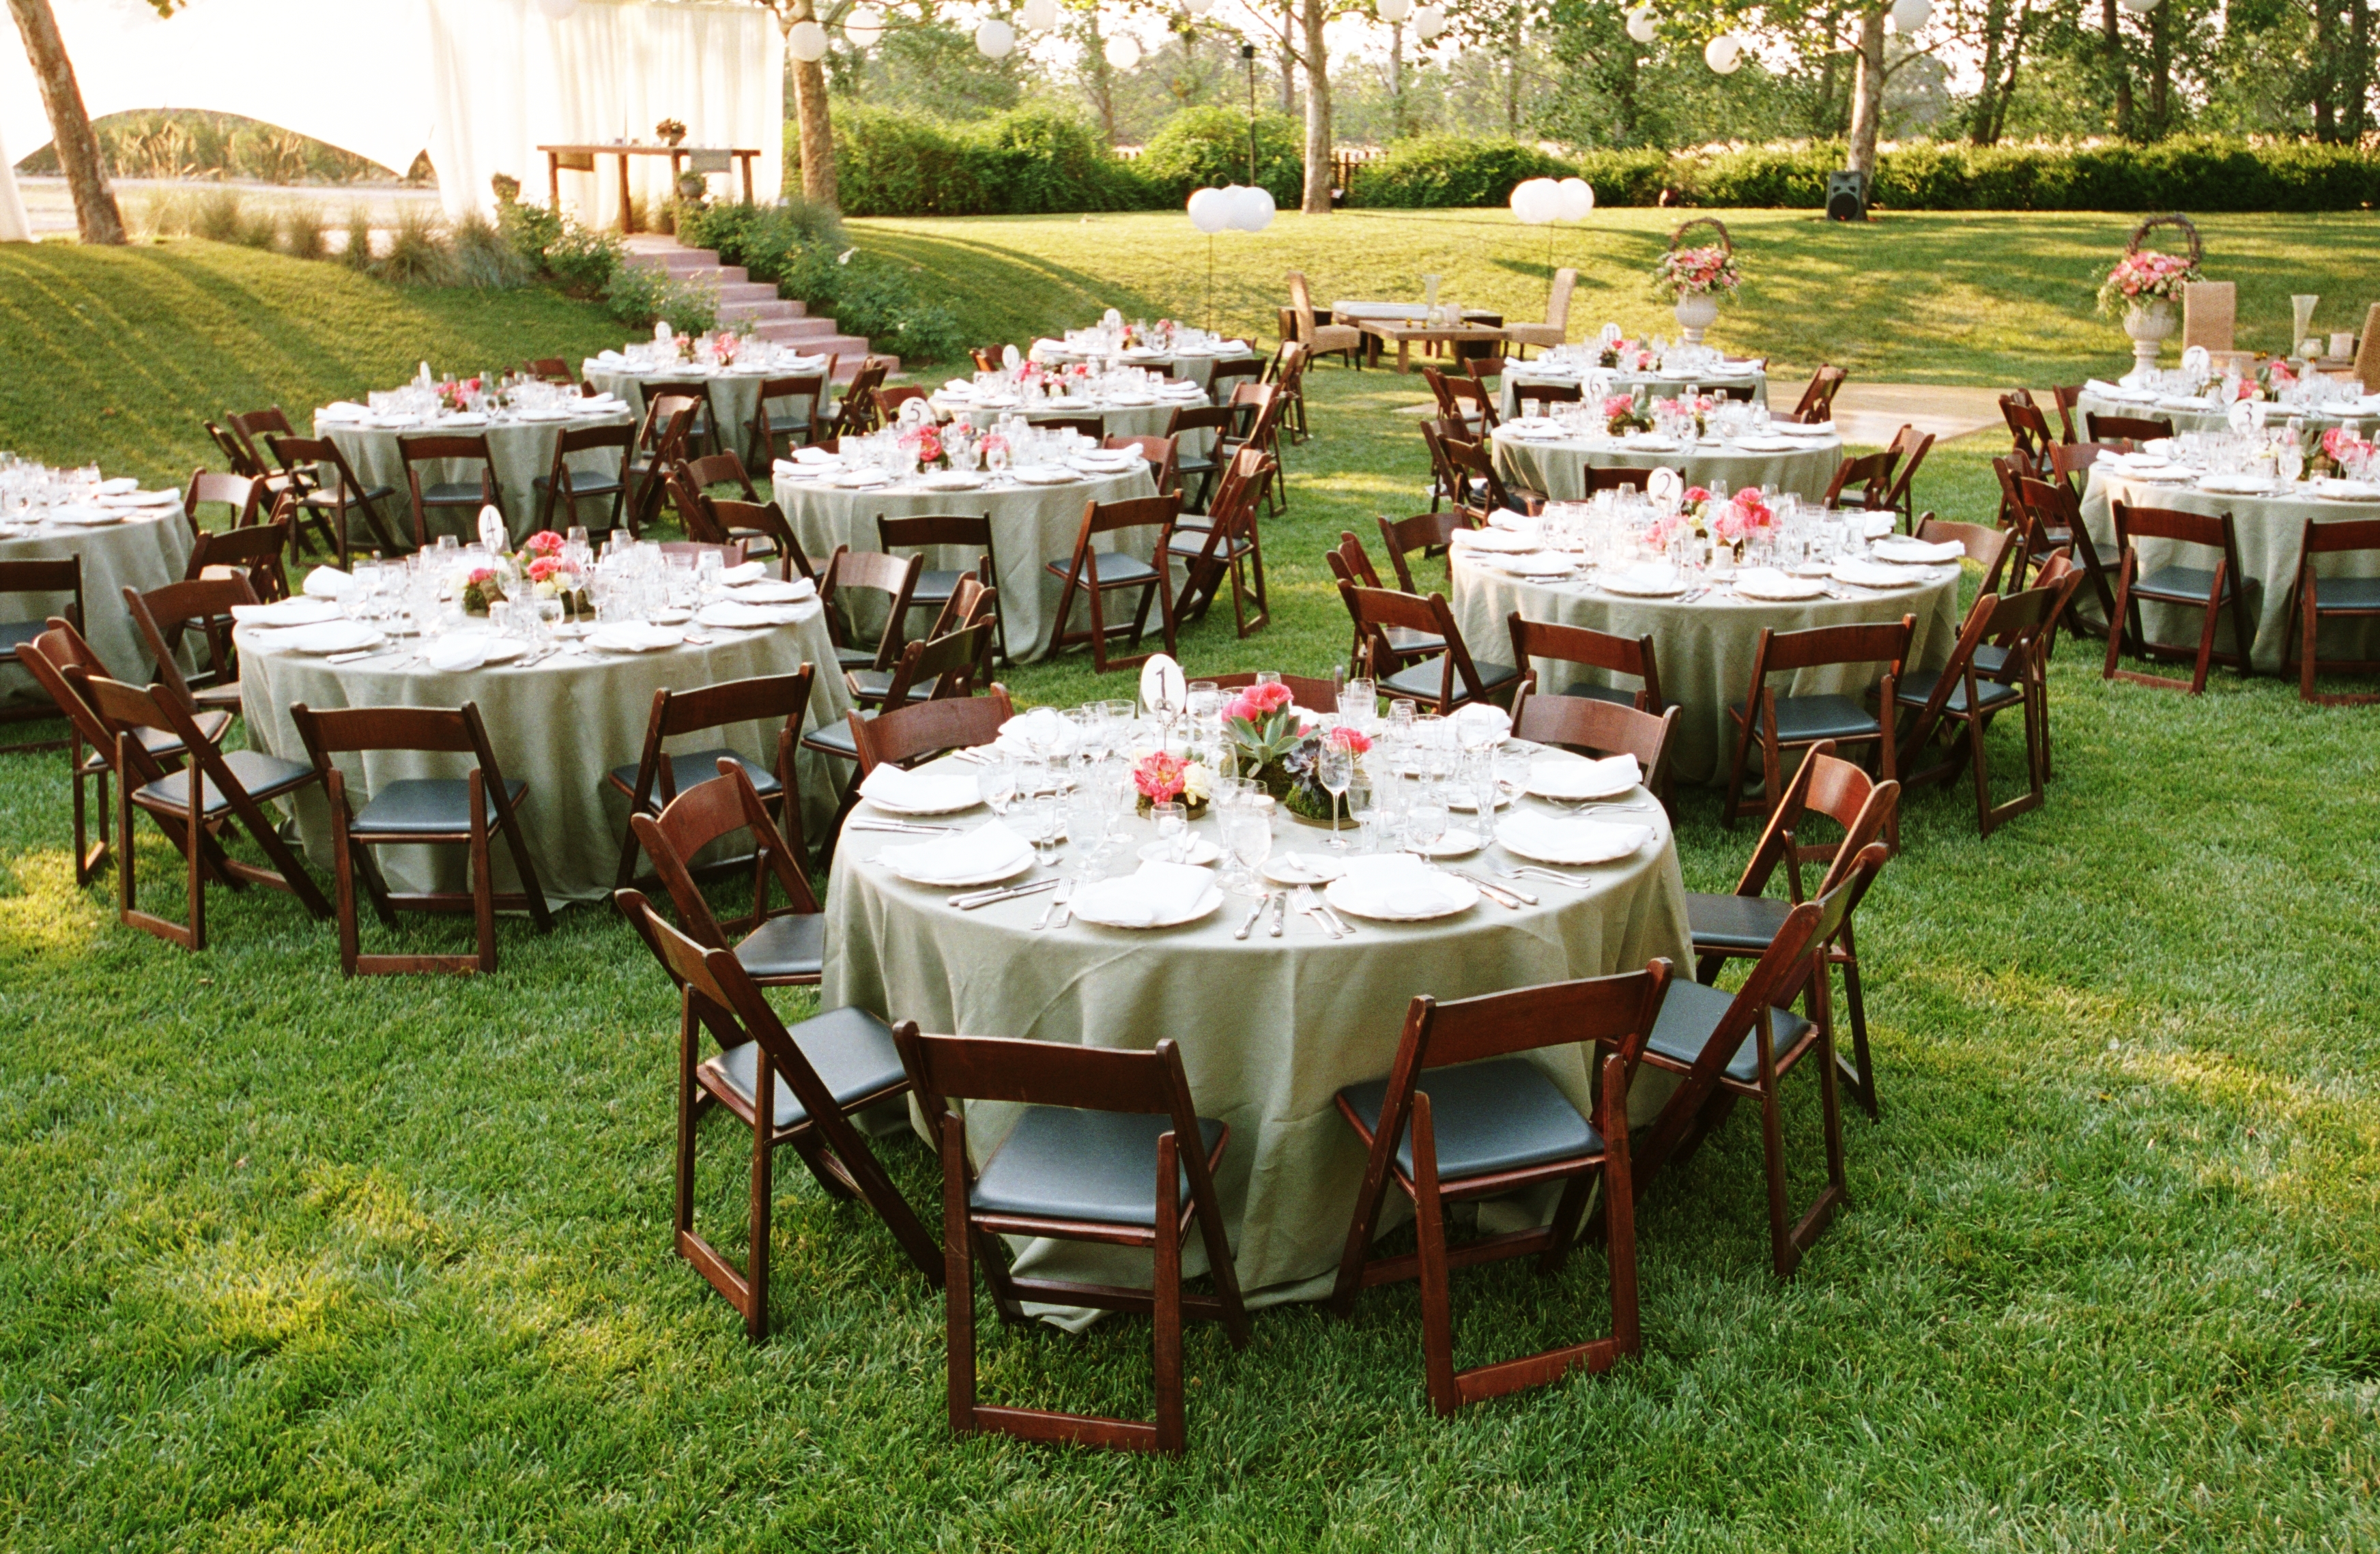 Reception, Flowers & Decor, Decor, white, pink, Wedding, Farm